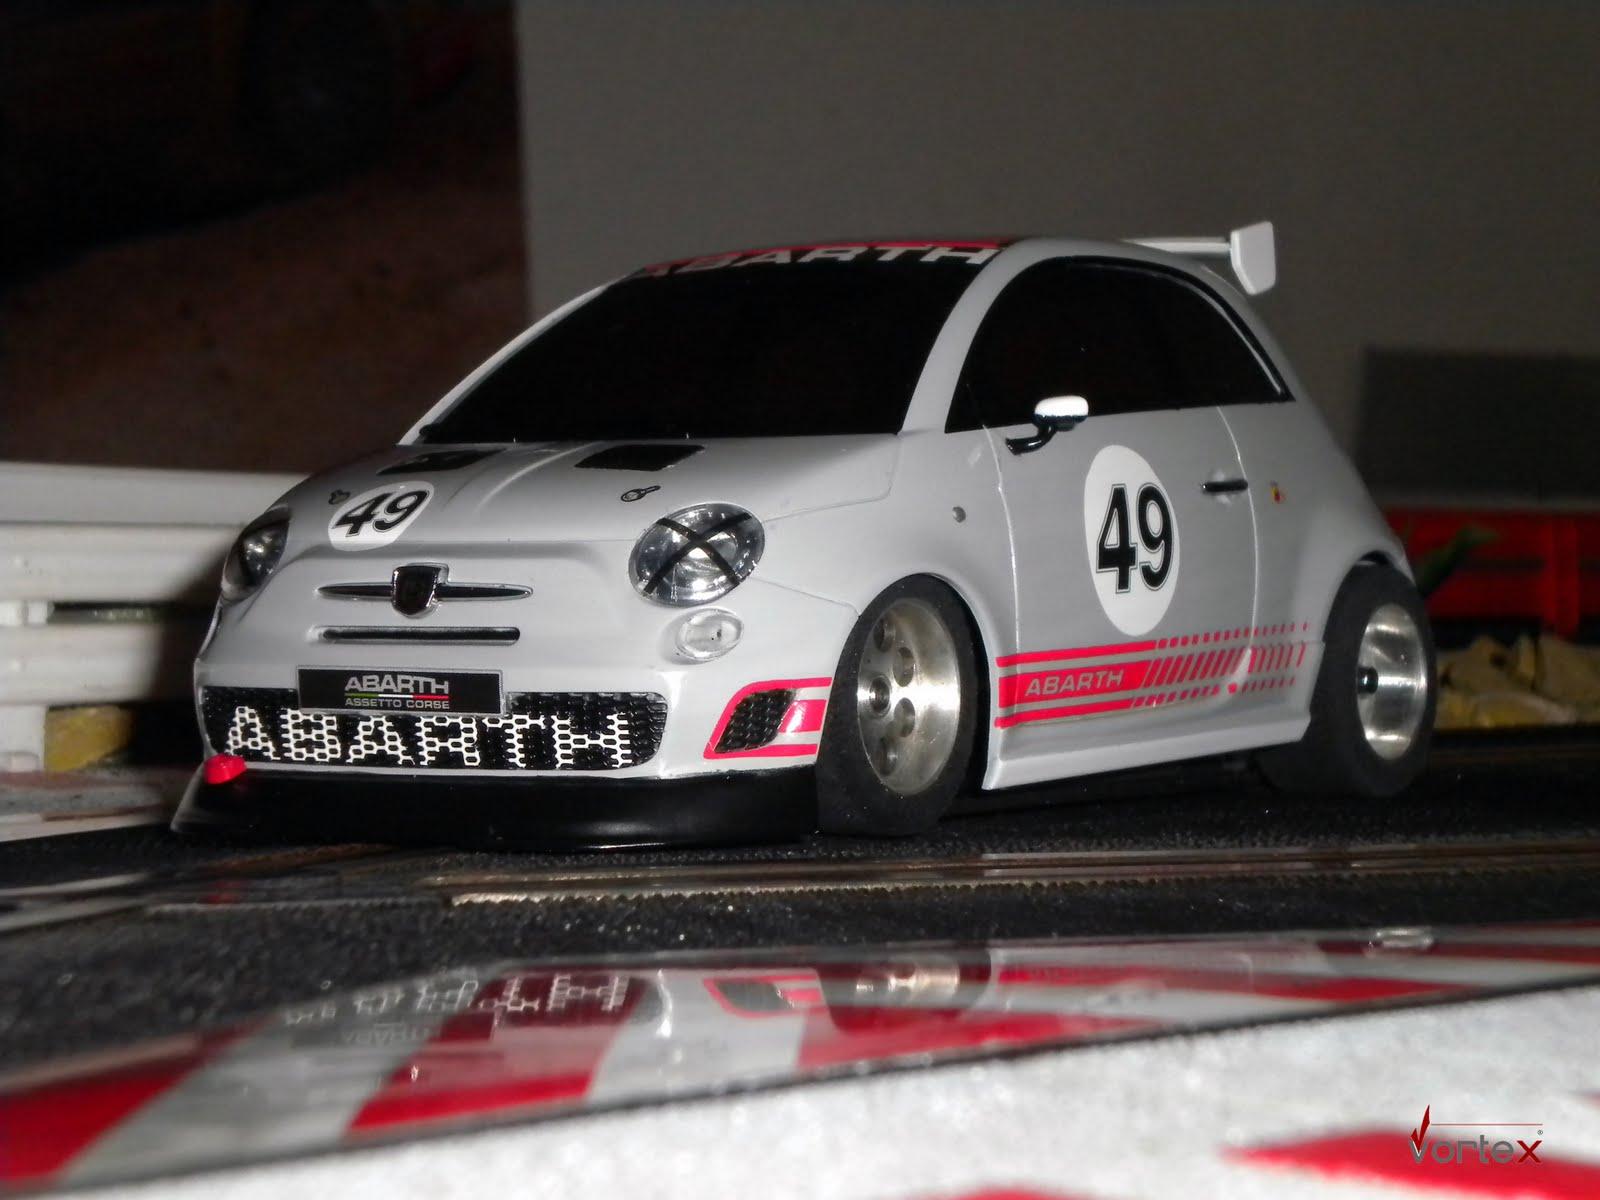 Kyoshosan Pn Slot Fiat Abarth 500 Racing V2 Rc Printed Circuit Board Assembly Mr03 Setting